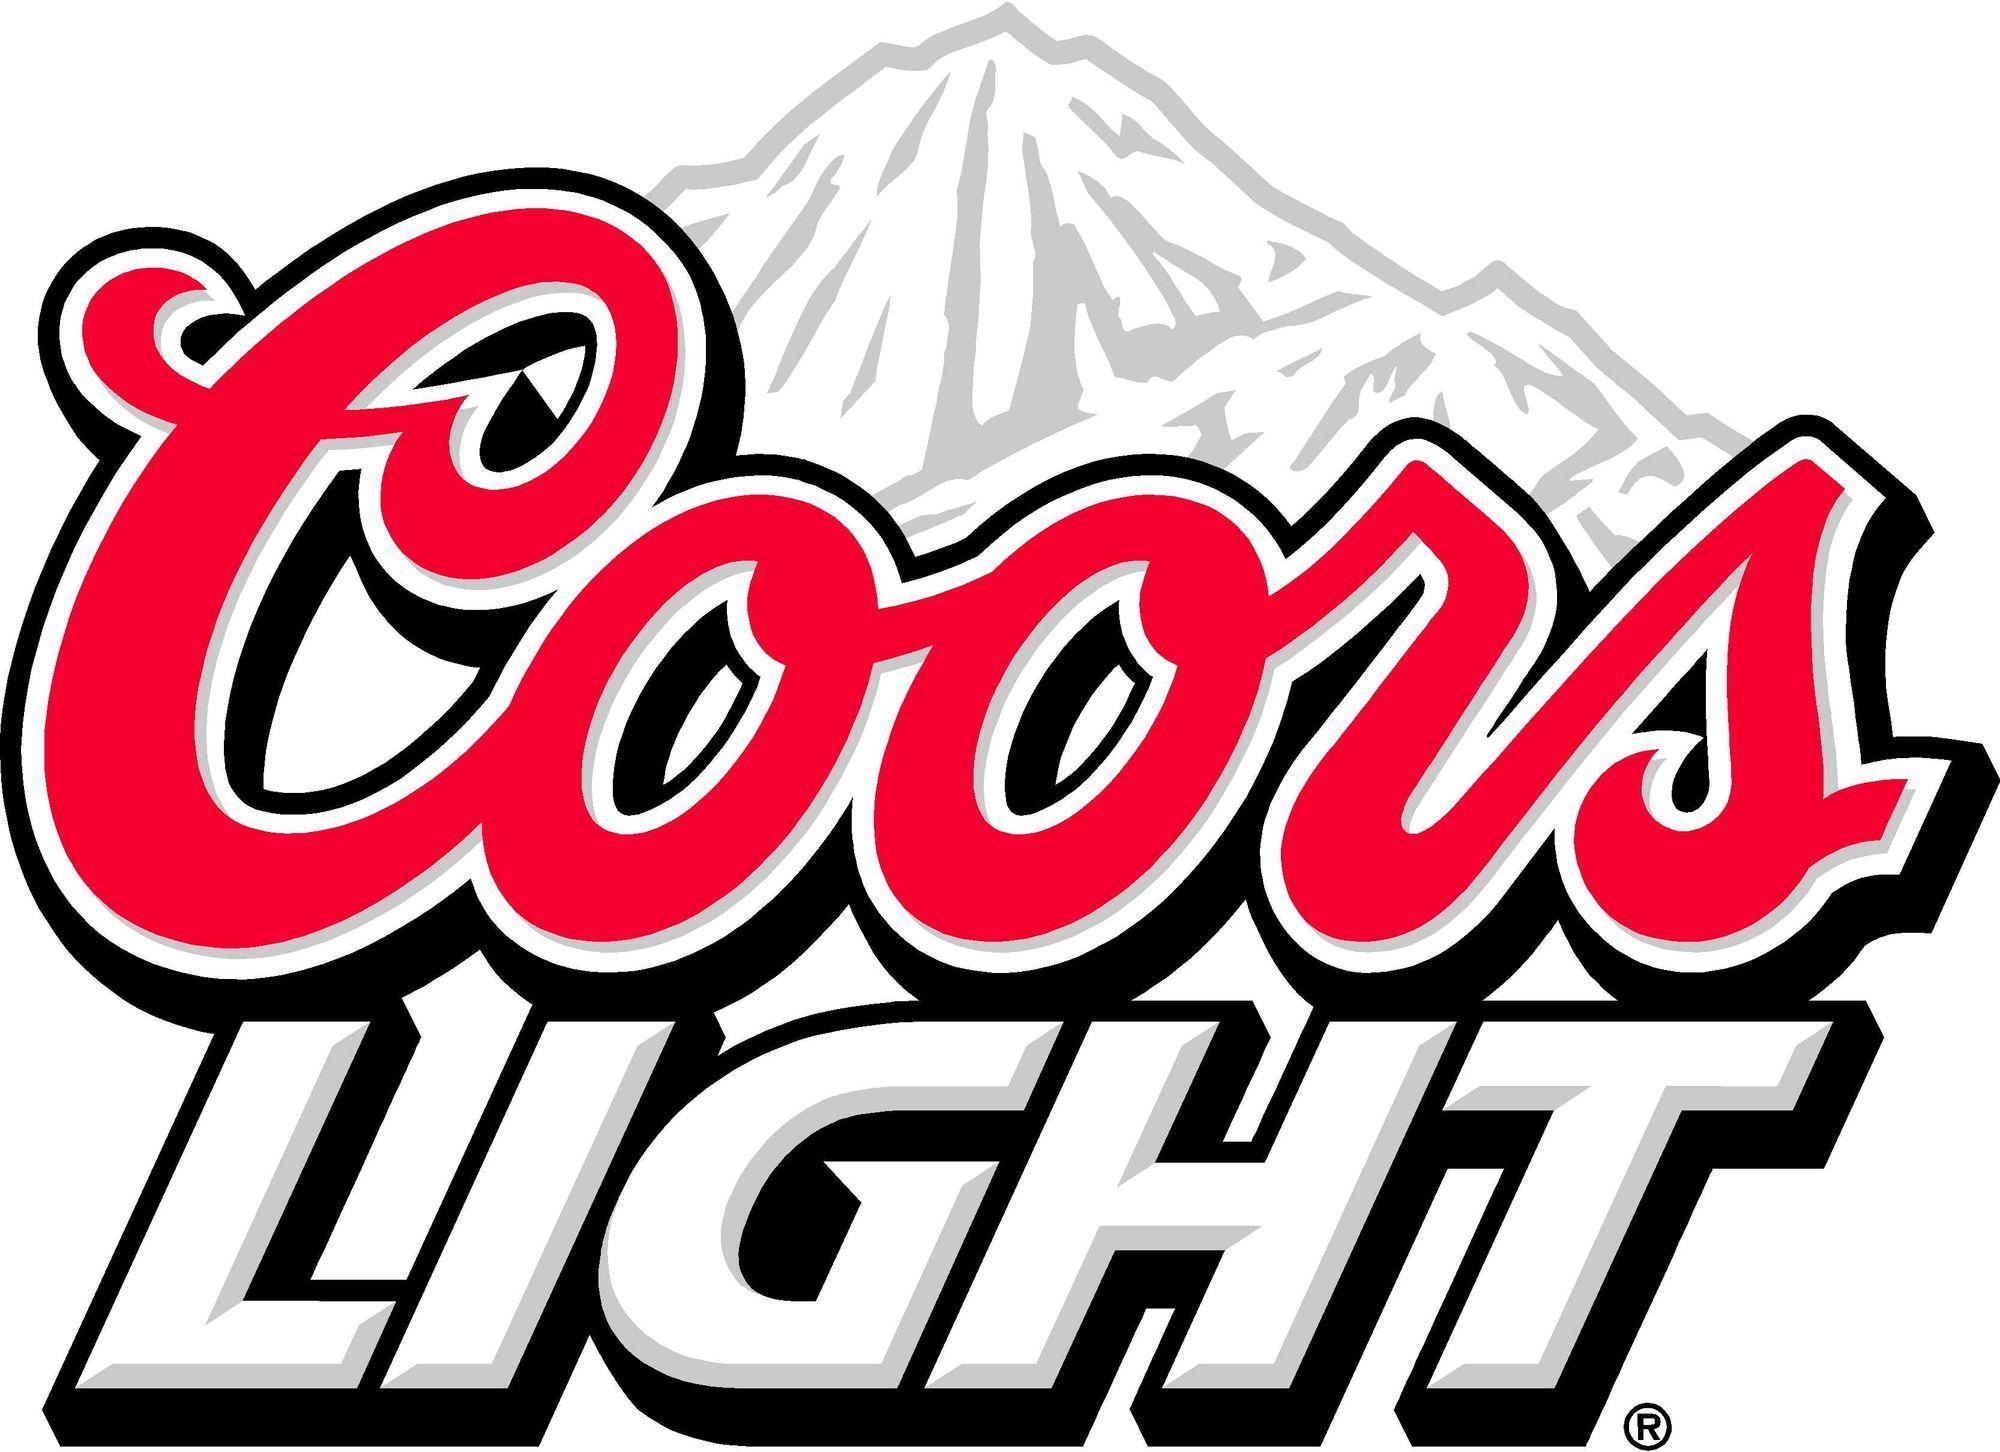 coors light logo Google Search Beer logo, Beer, Beer